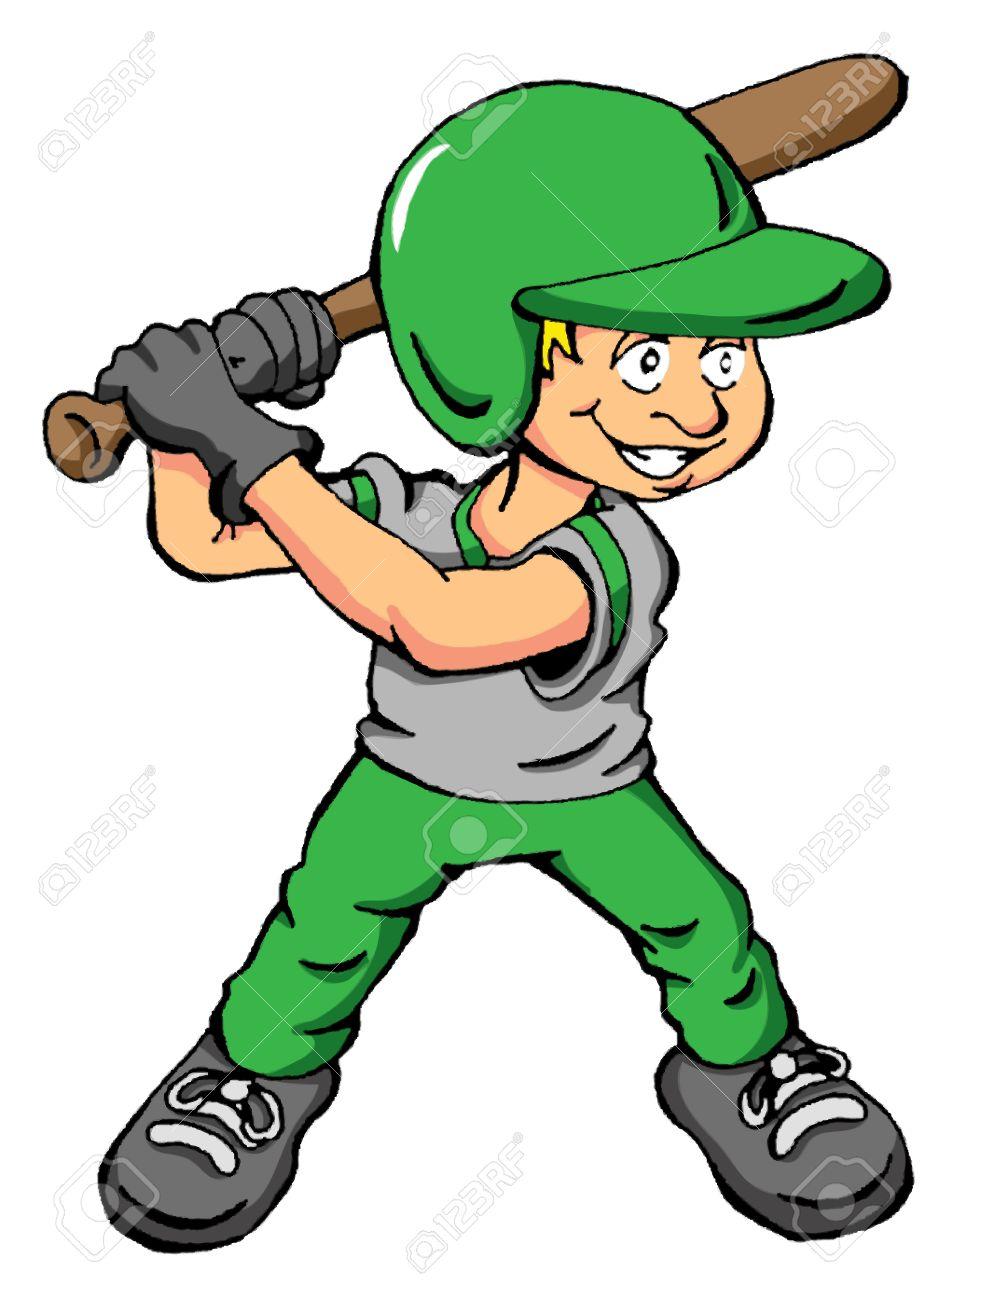 Vector cartoon of a boy about to swing a bat Stock Vector - 24921318